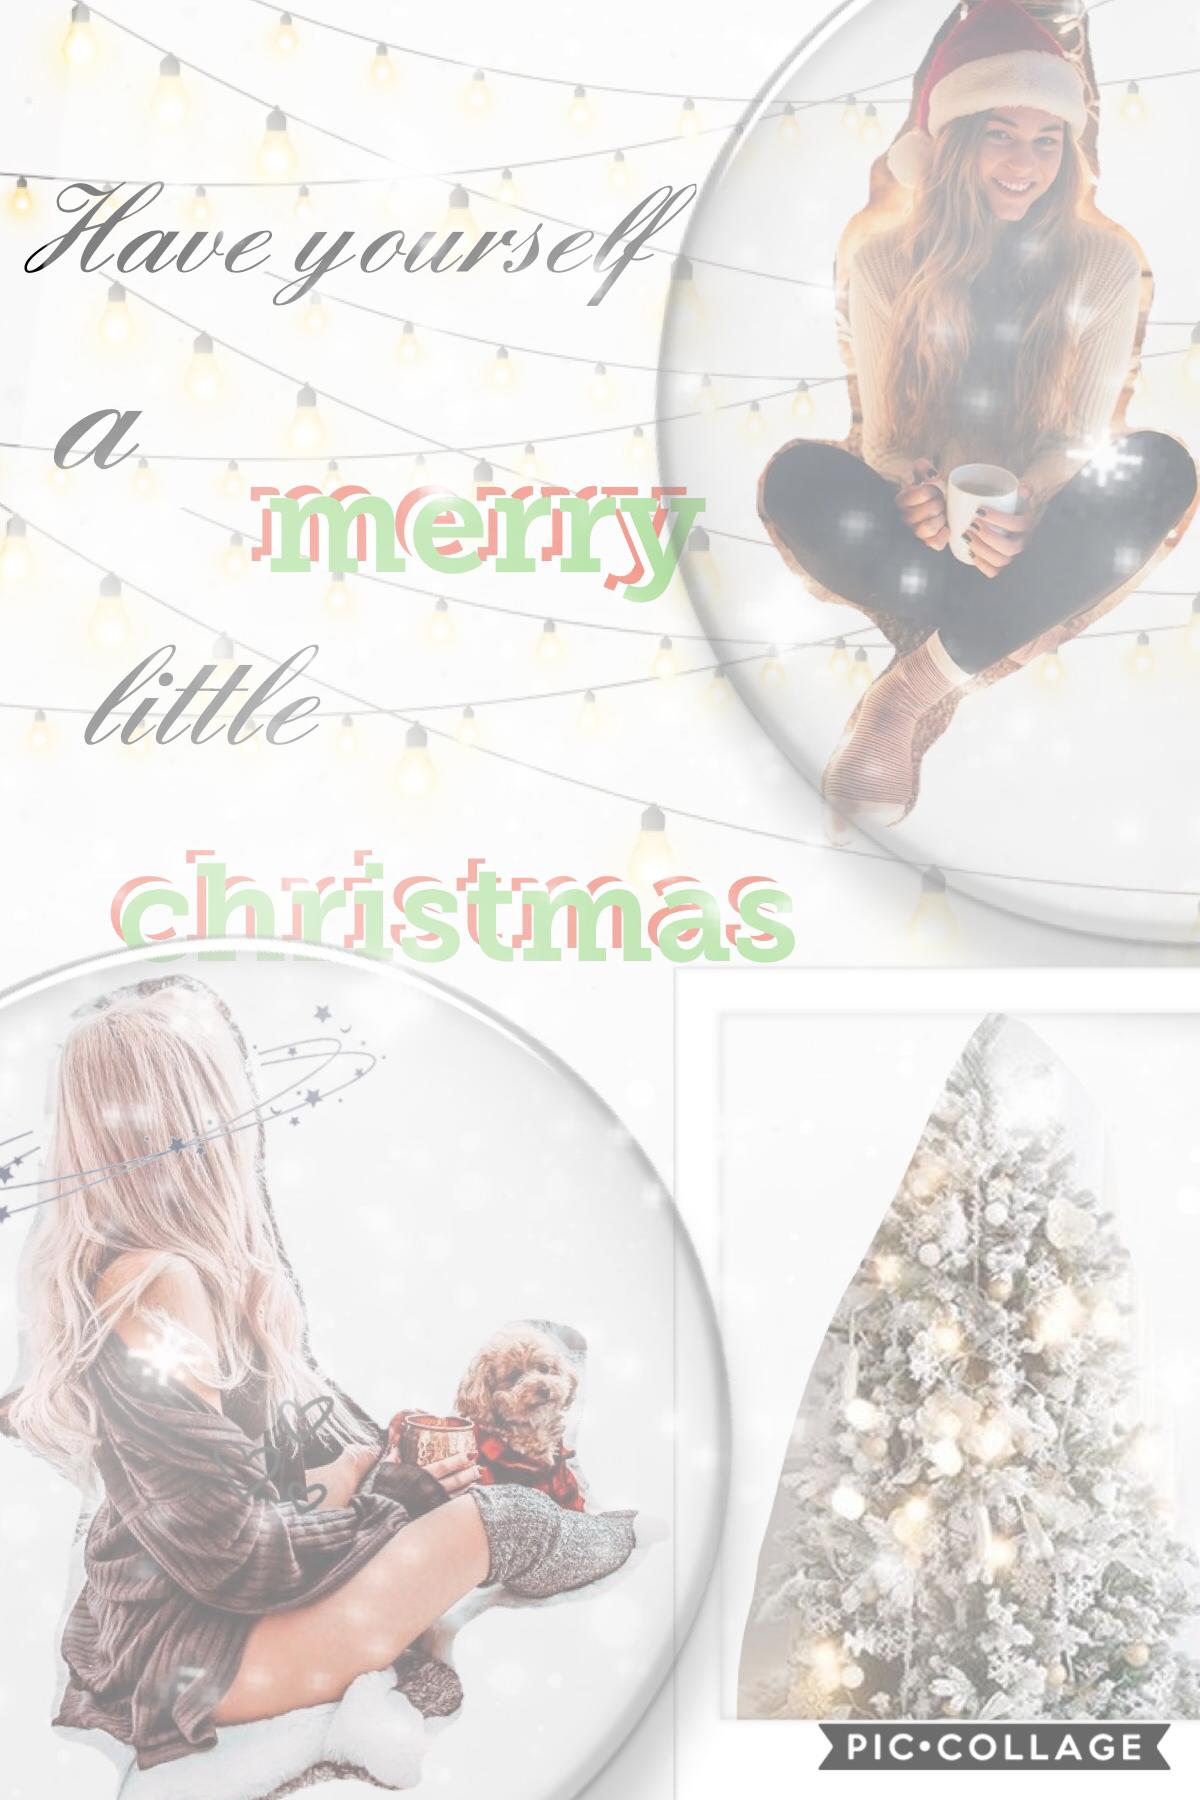 Merry Christmas Eve!! 🎄✨